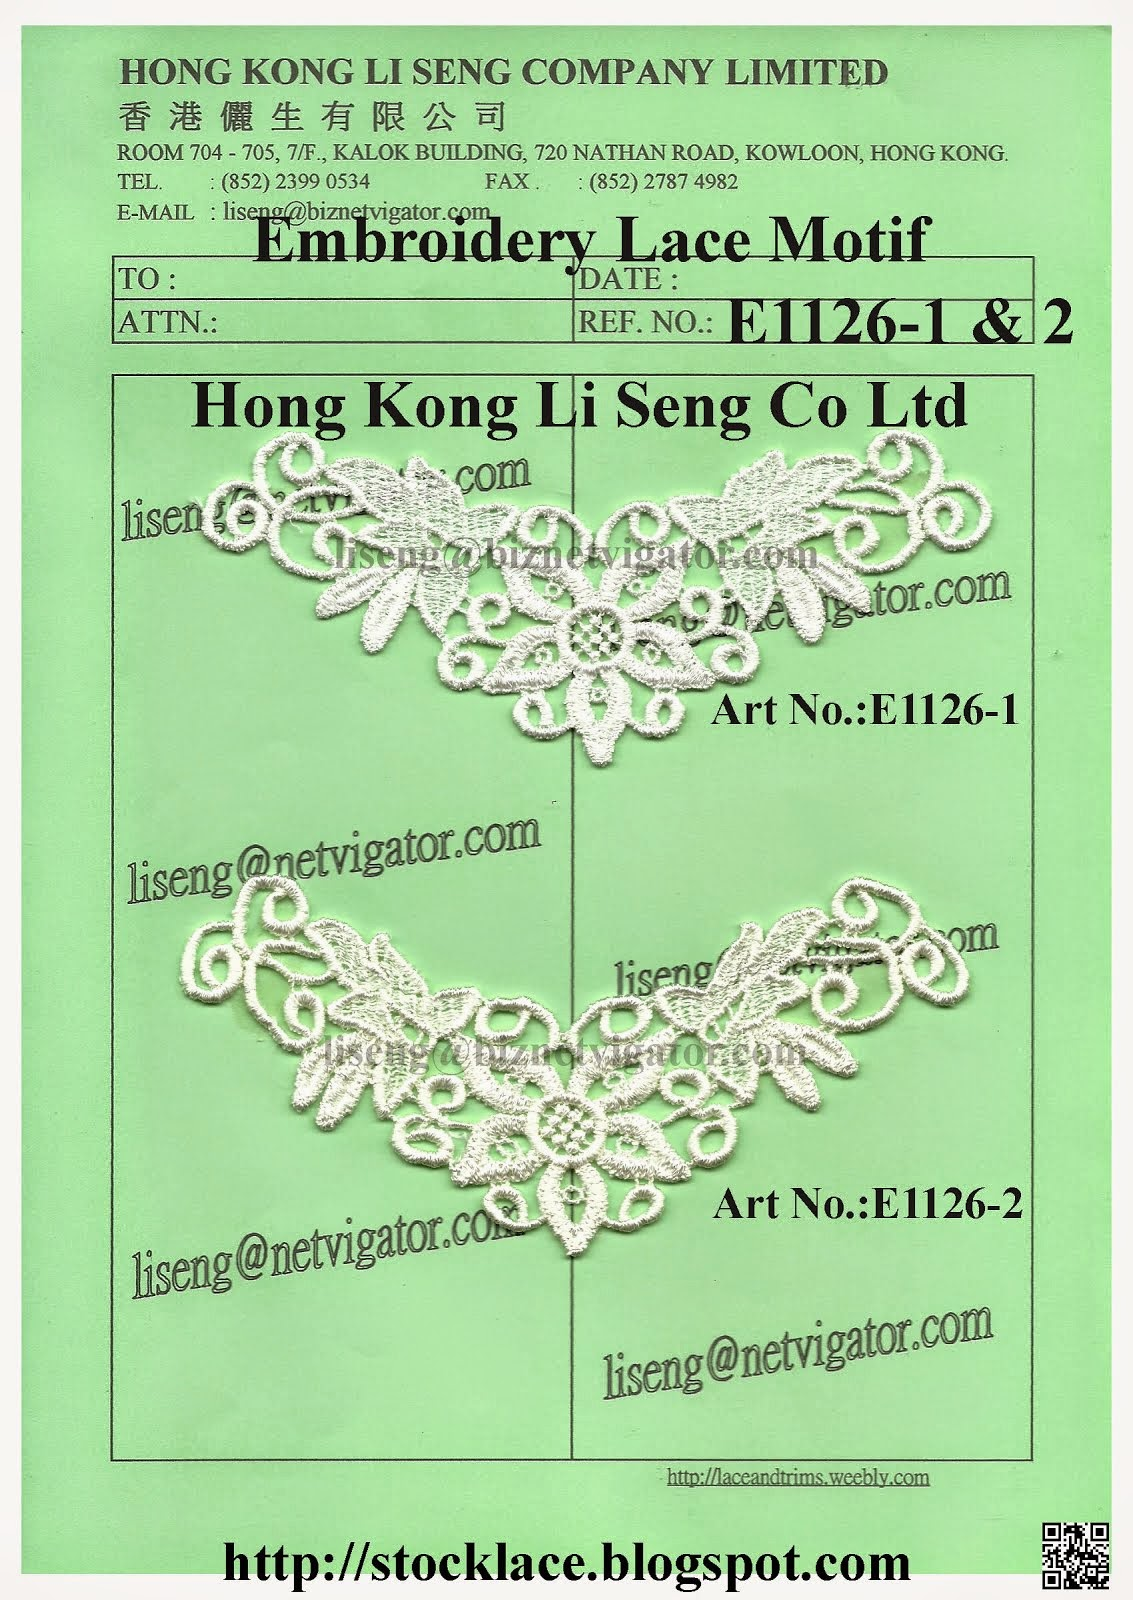 New Stock Embroidery Lace Motif Manufacturer, Wholesale and Supplier - Hong Kong Li Seng Co Ltd